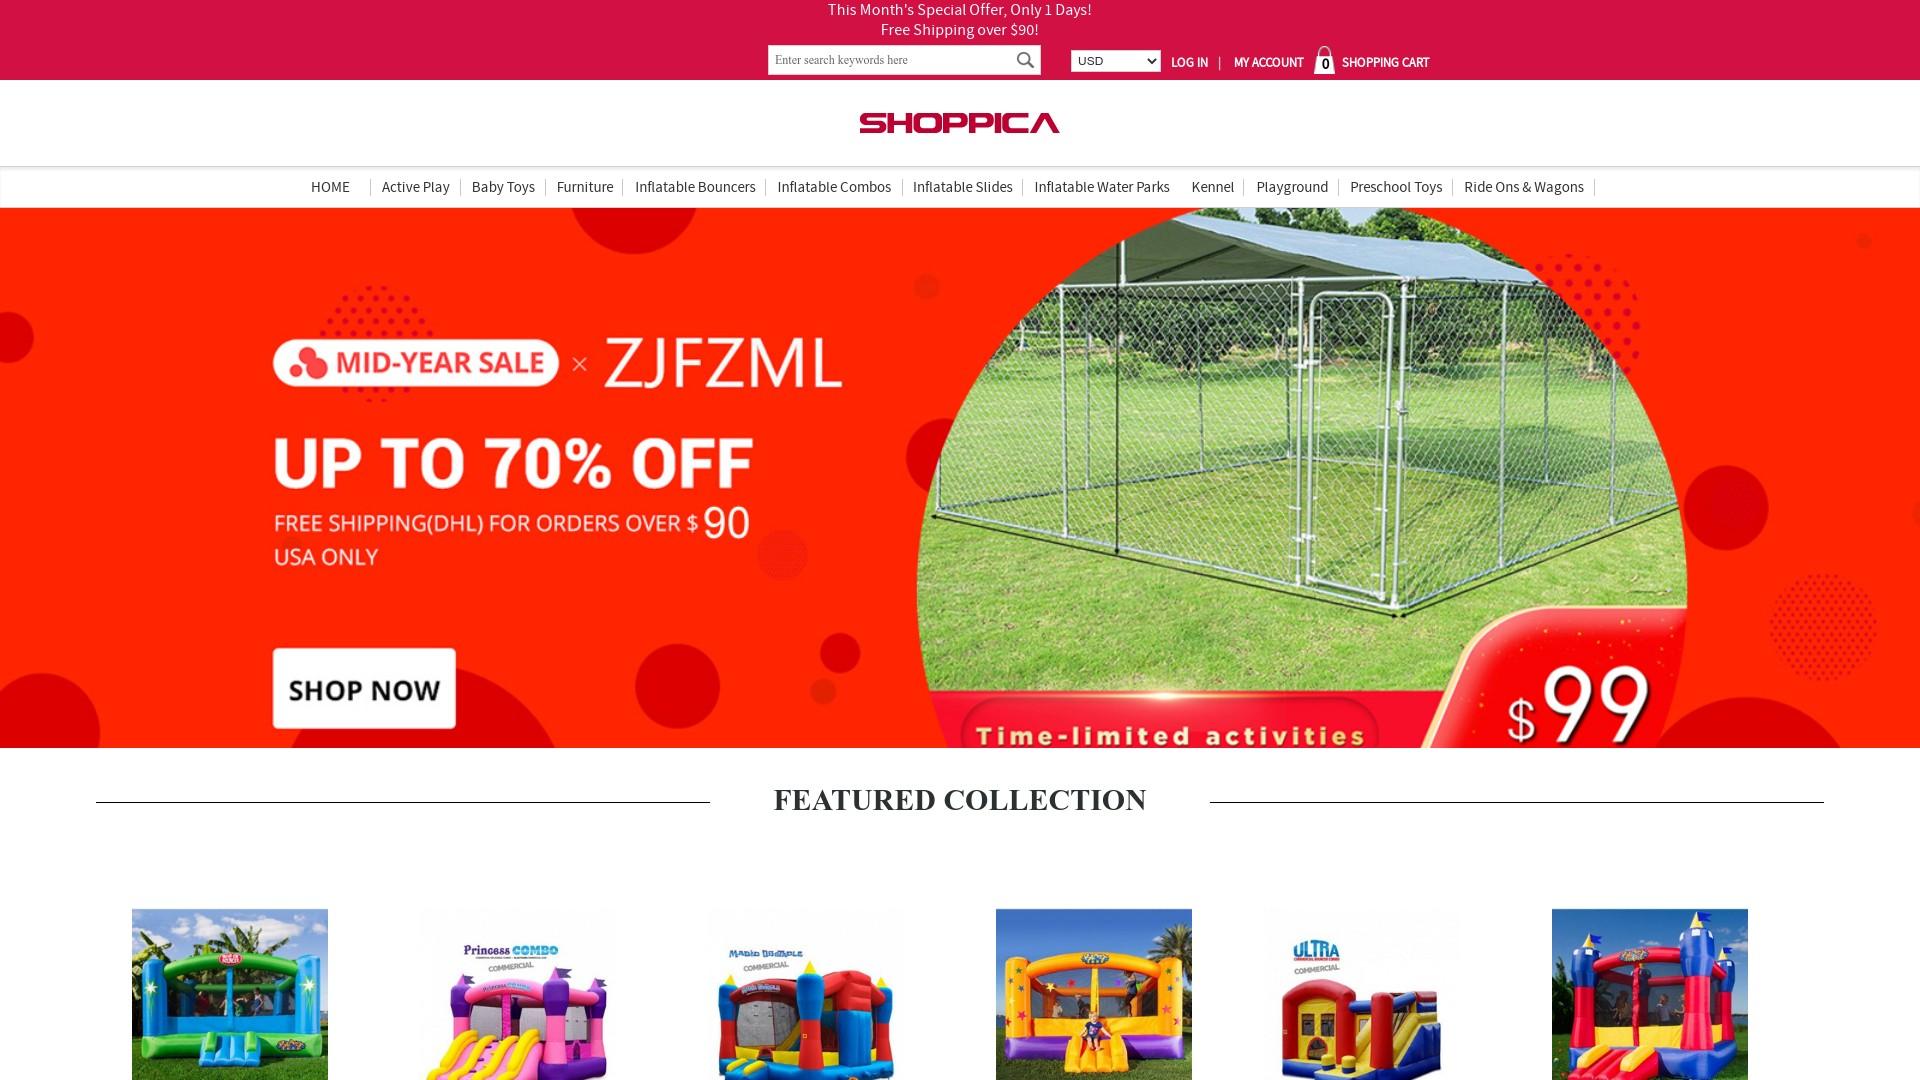 GGmediainc.com is a Scam and Fake Shoppica Online Store